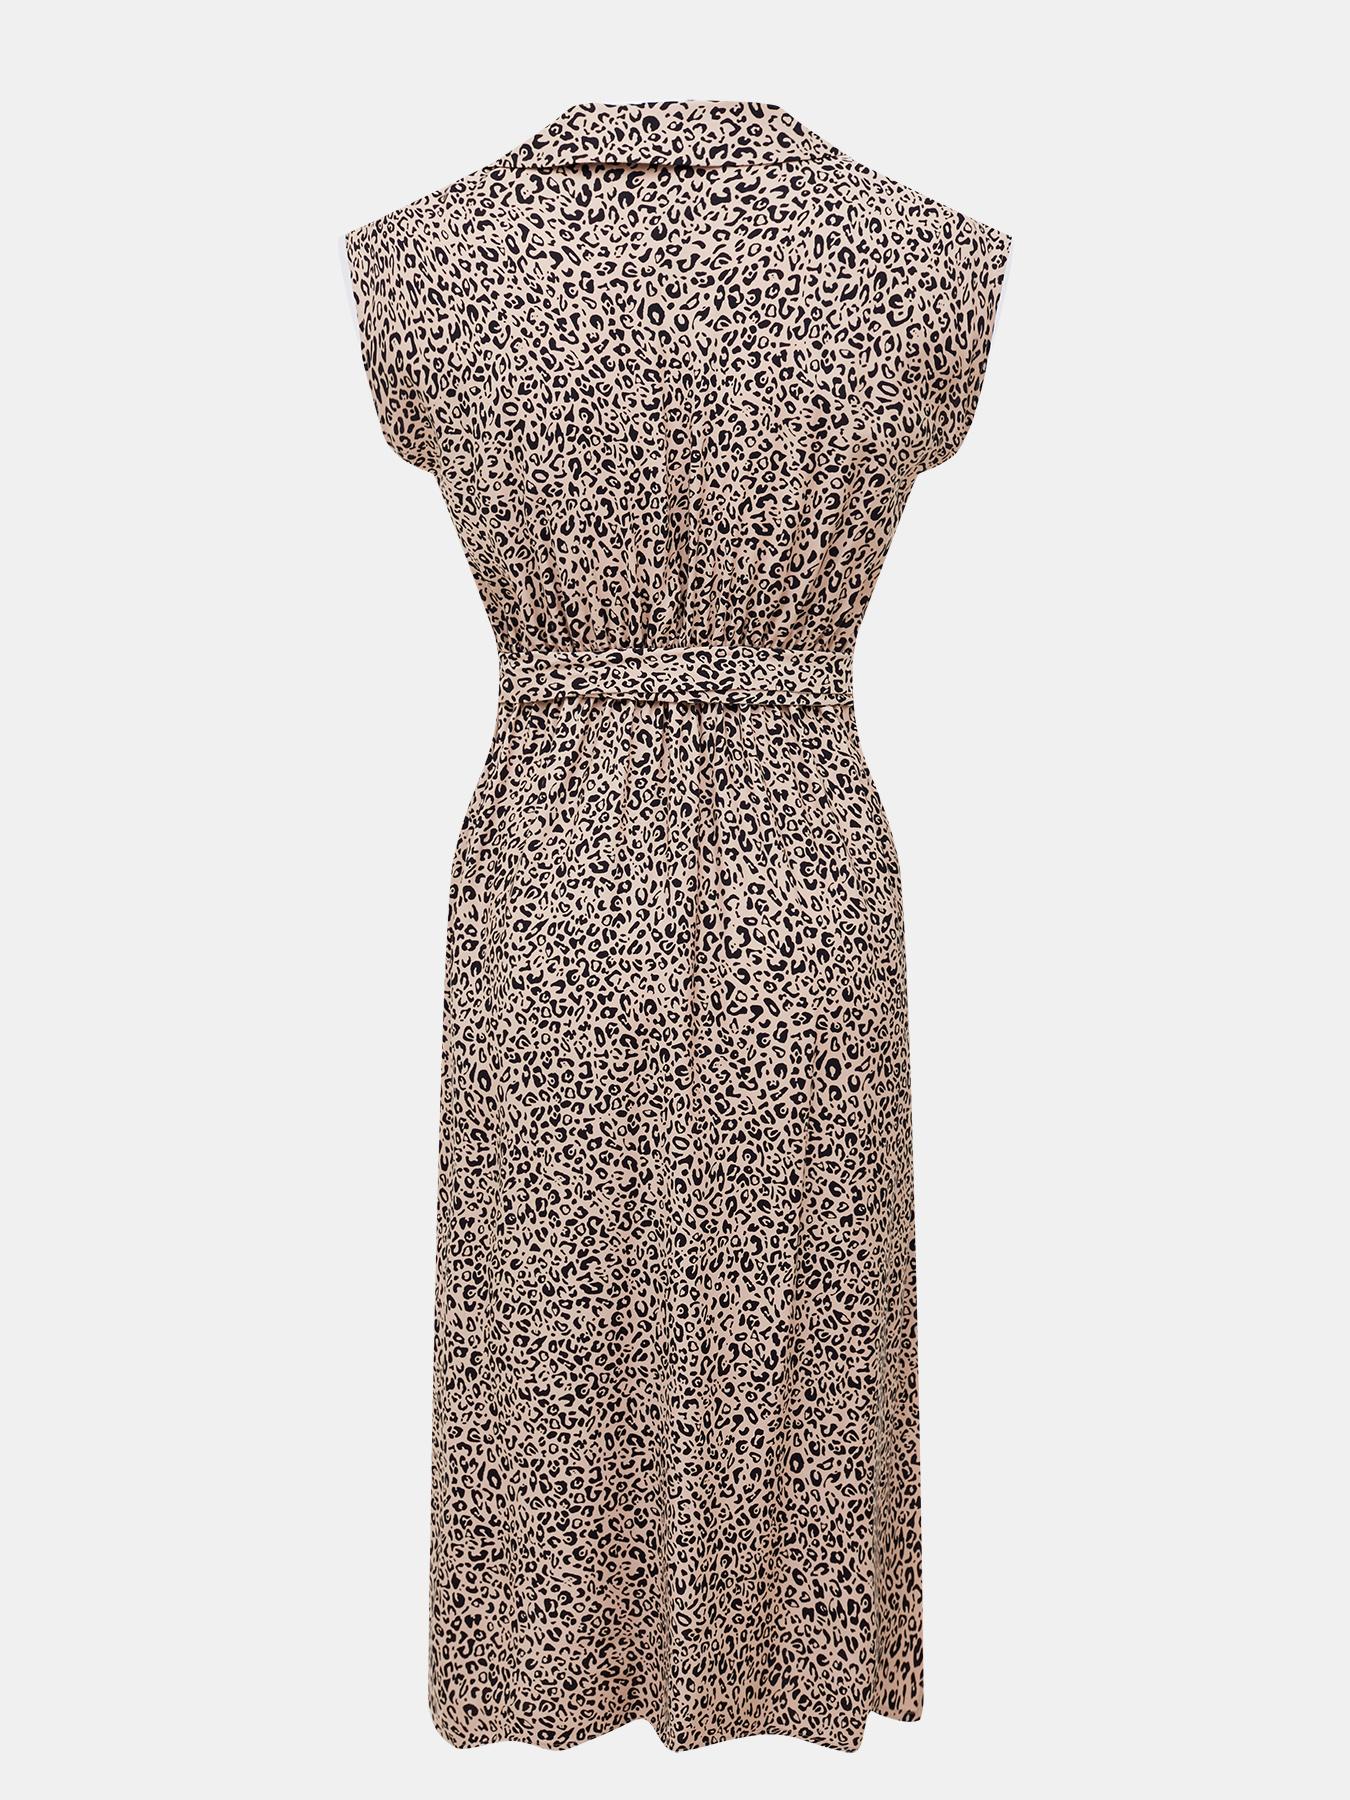 Платье Pennyblack Платье